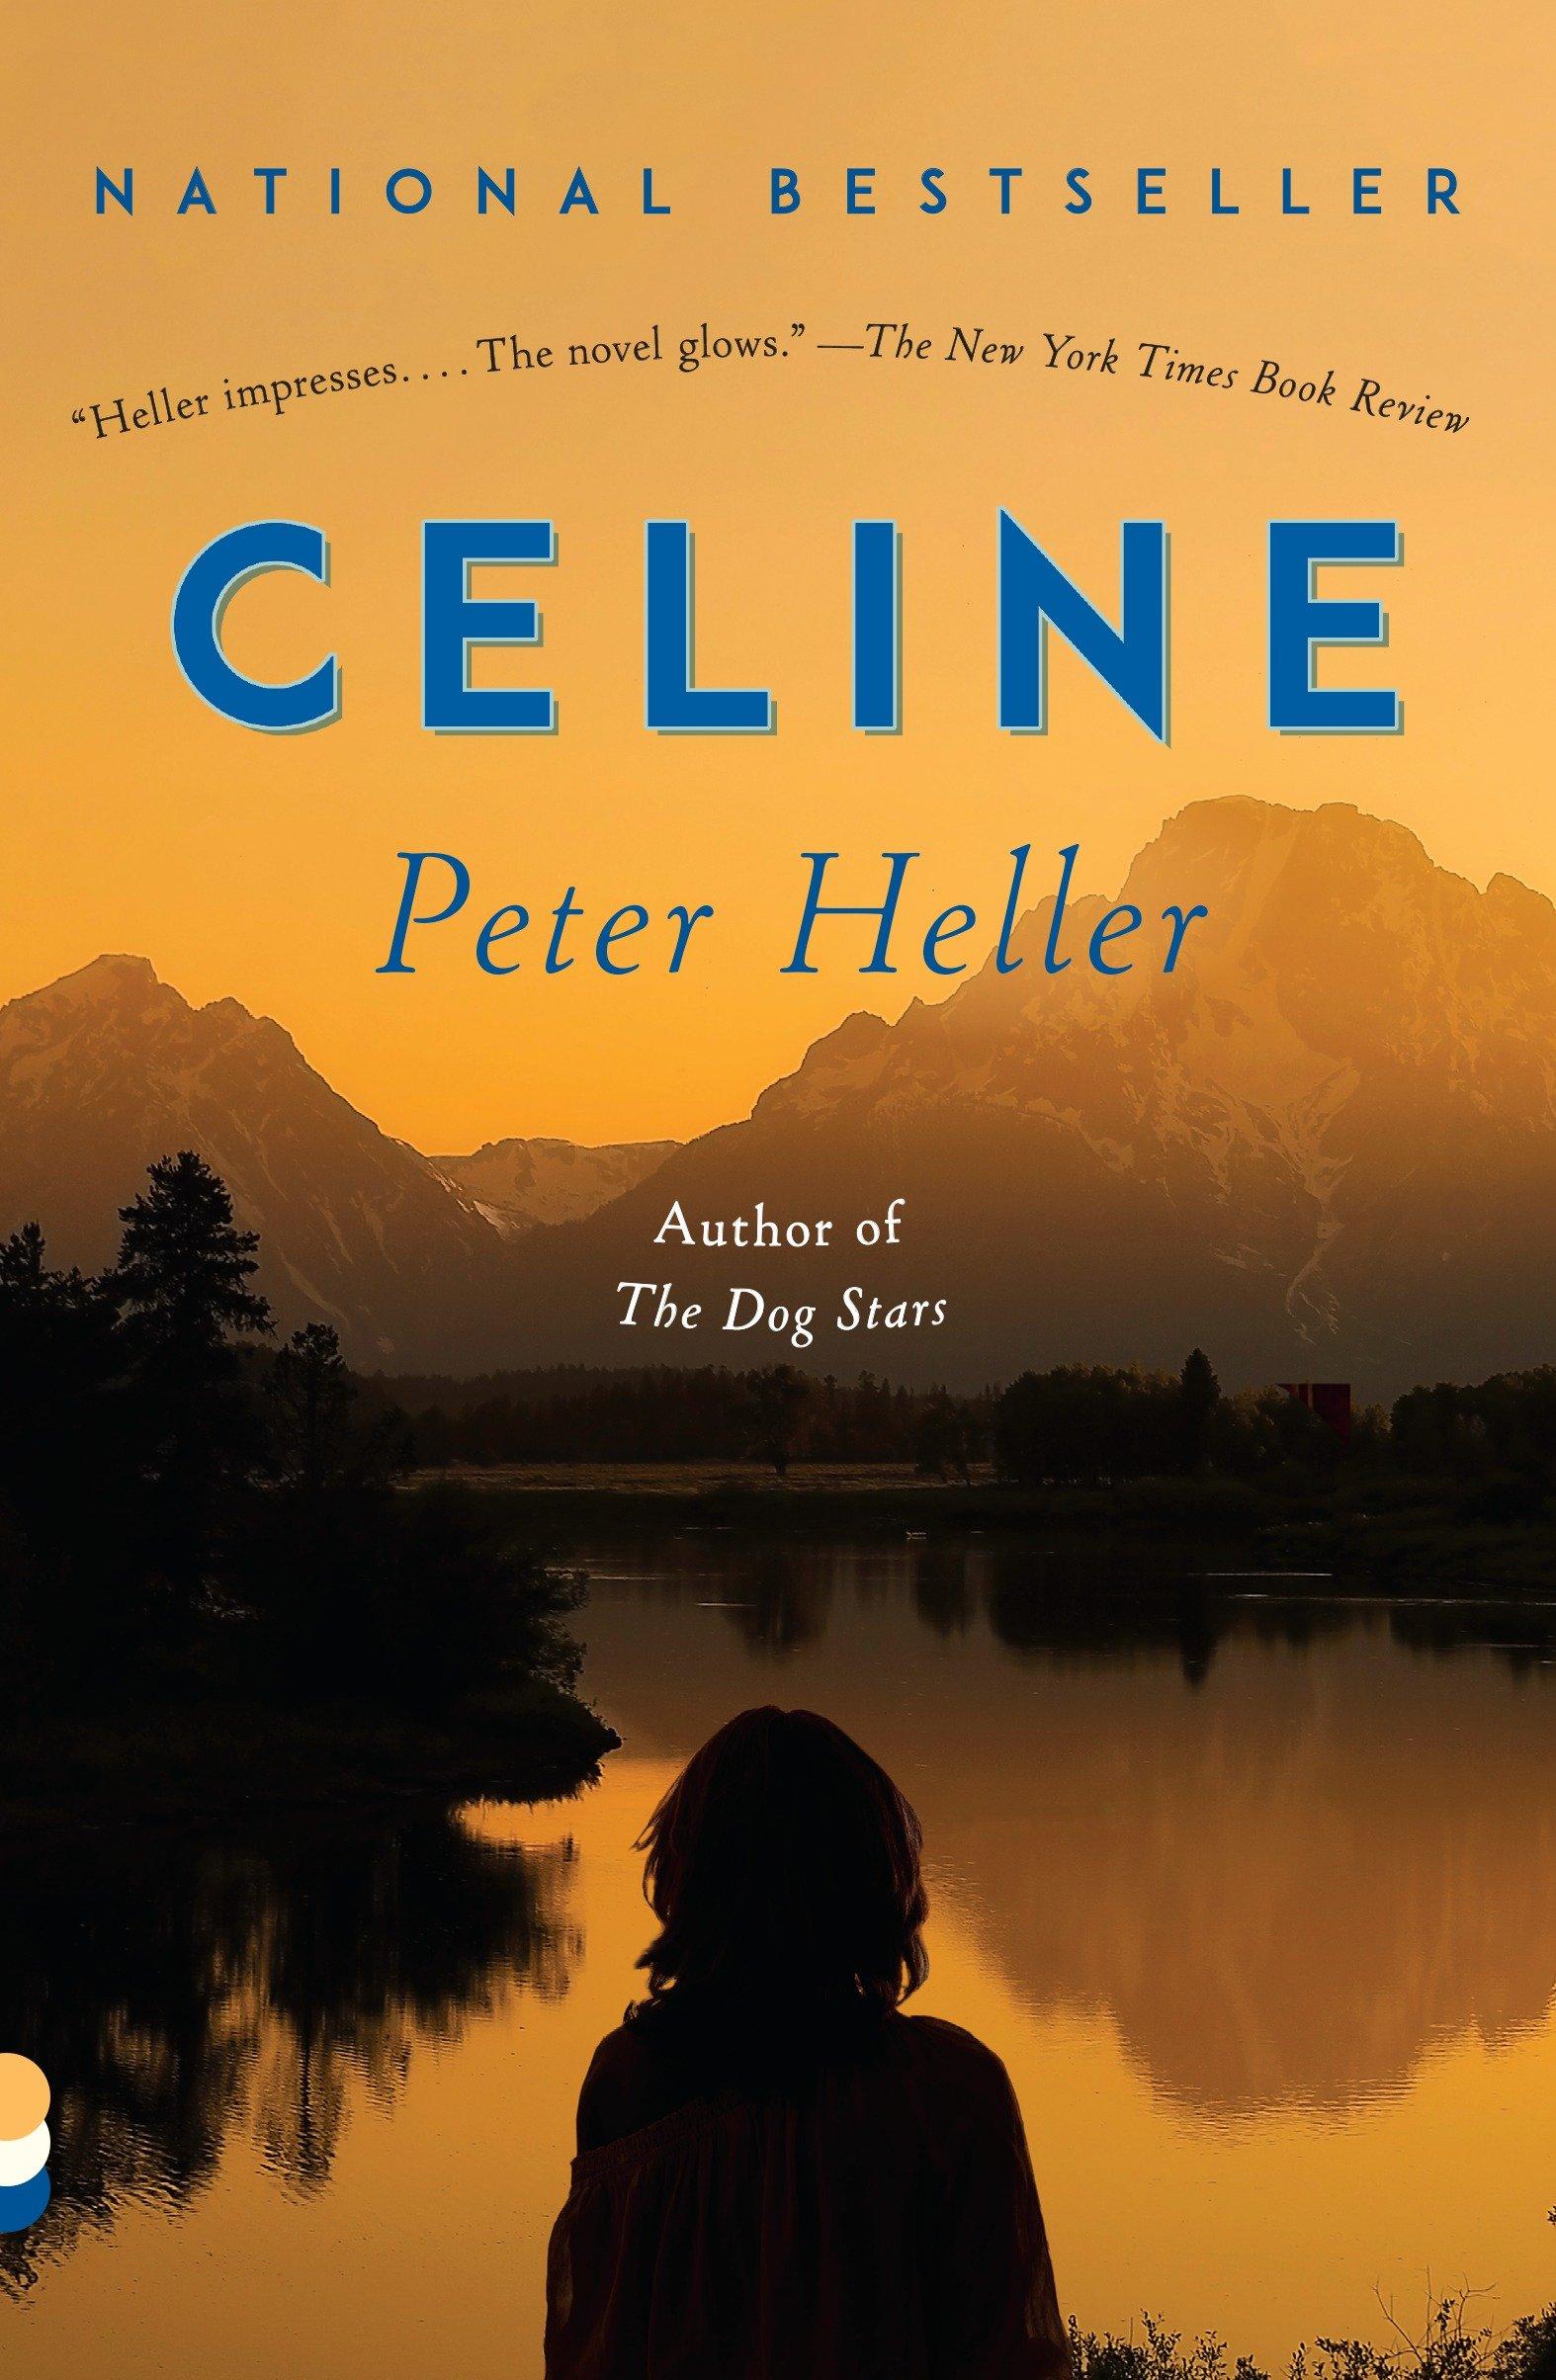 Celine A novel